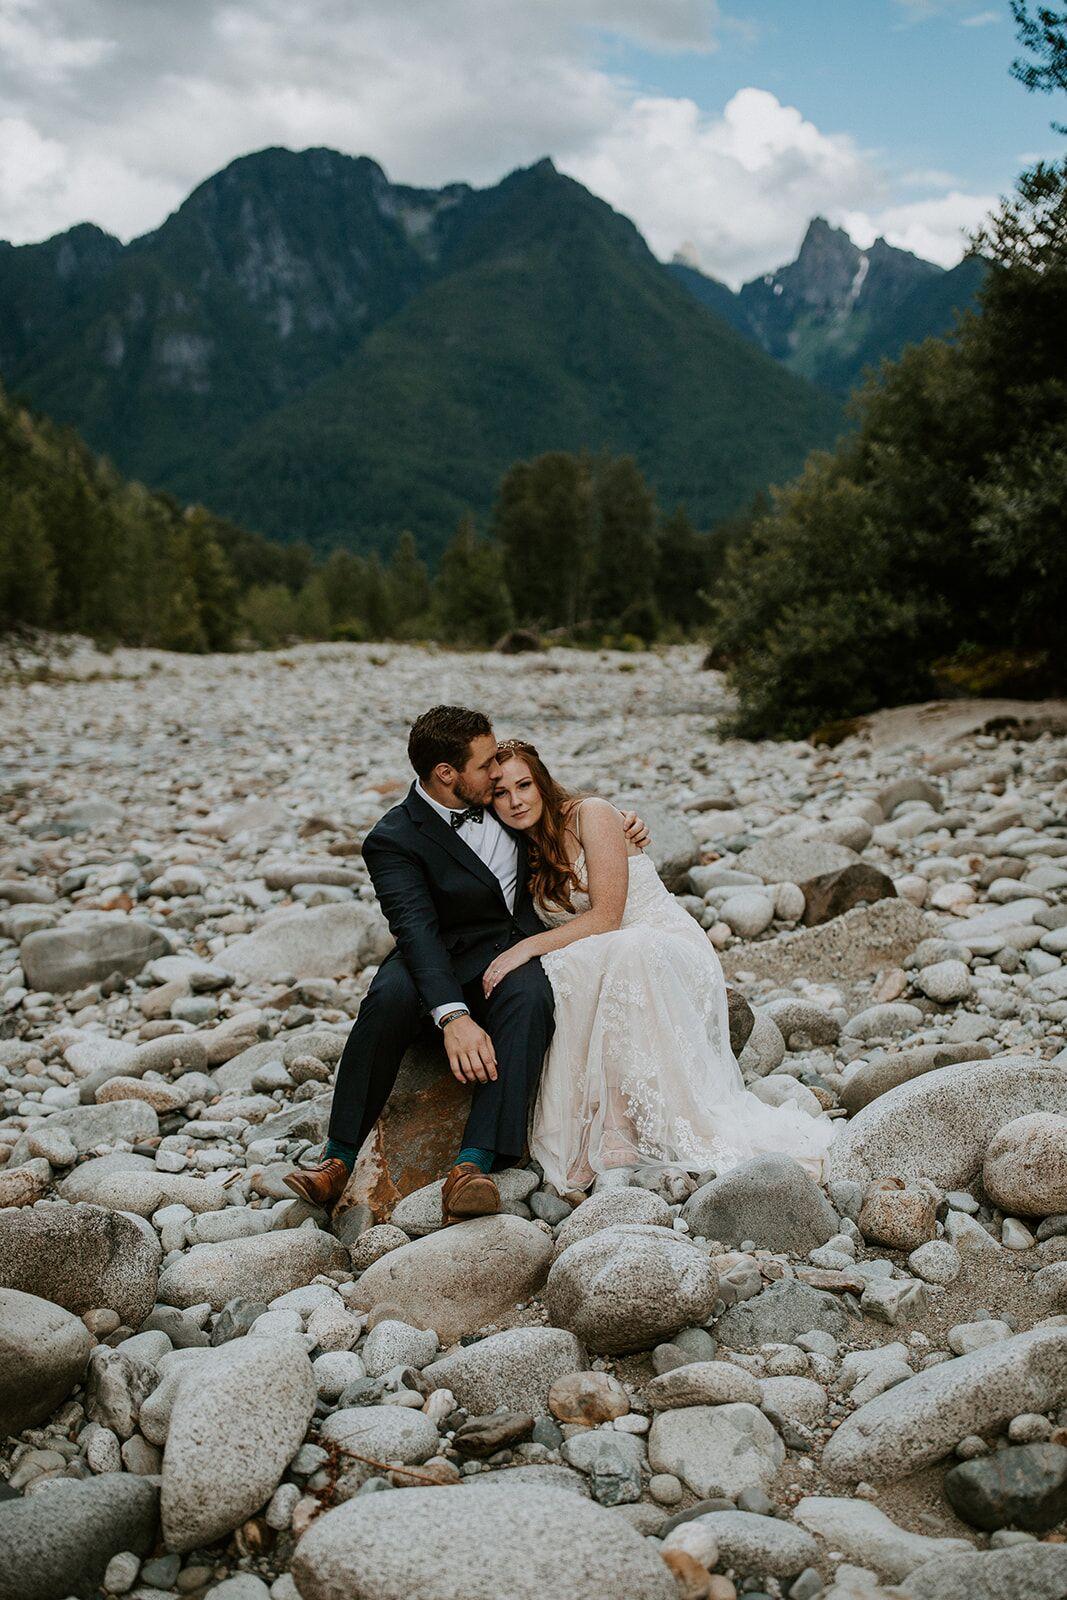 Blue-Sky-Ranch-Wedding-Block-Weddings-and-Events14.jpeg